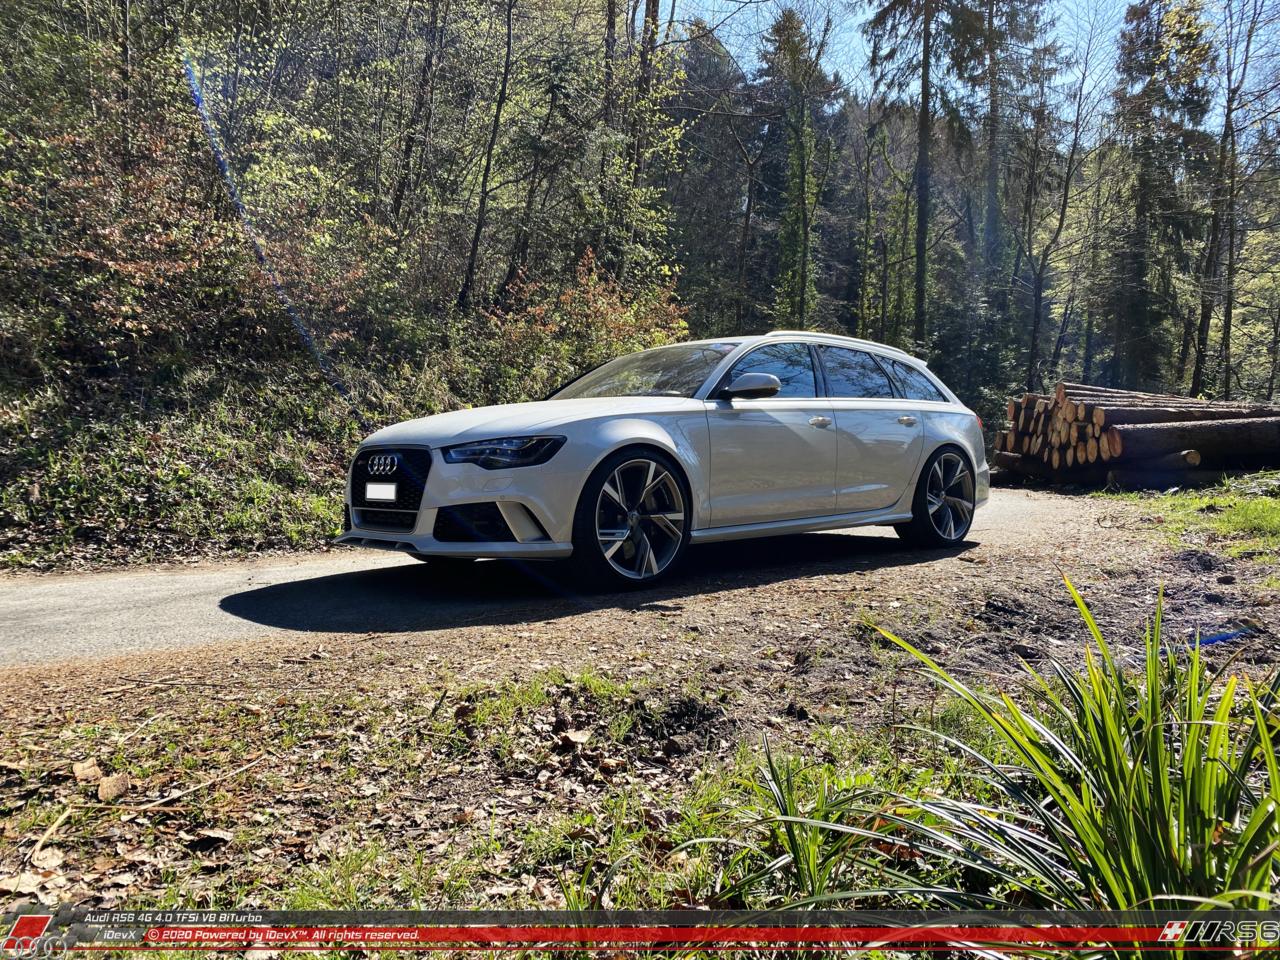 11.04.2020_Audi-RS6_iDevX_000.png